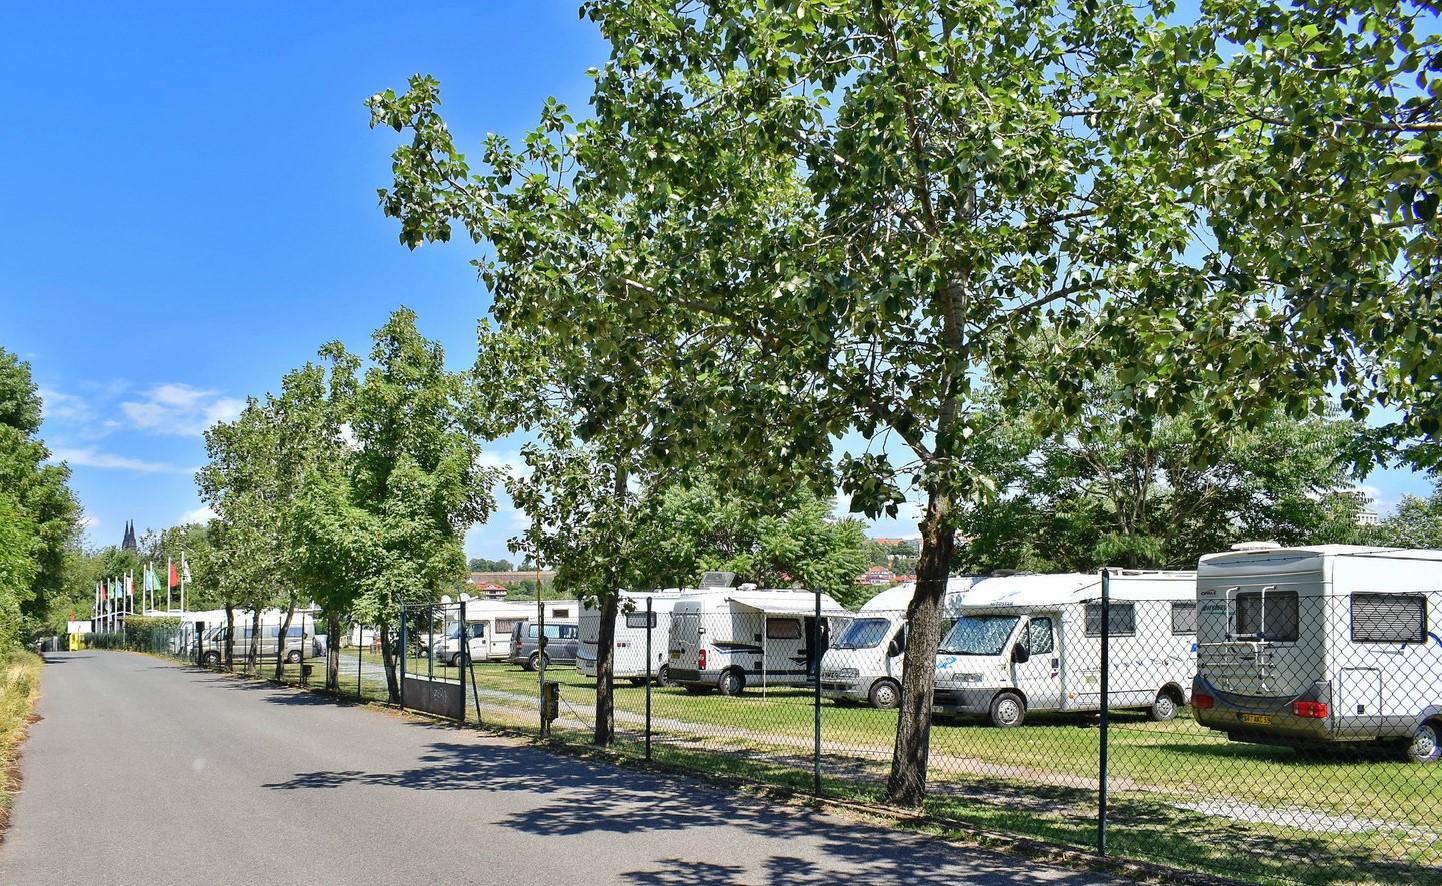 caravan camping. Black Bedroom Furniture Sets. Home Design Ideas